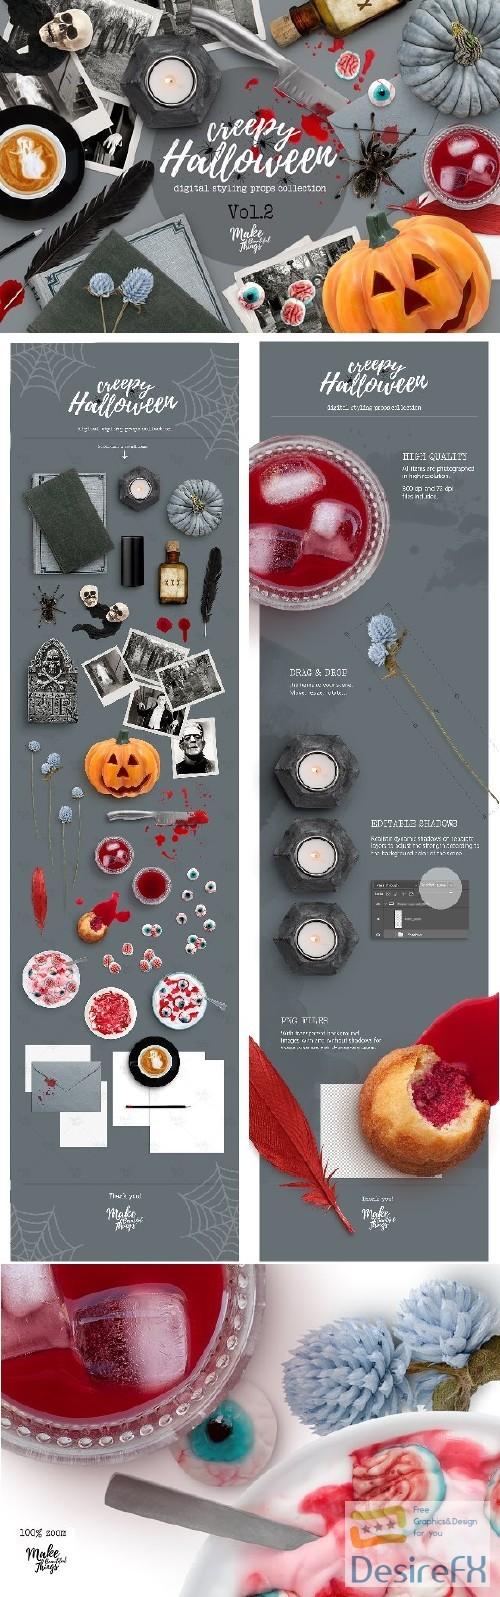 mock-up - Halloween Scene Creator - 2891823